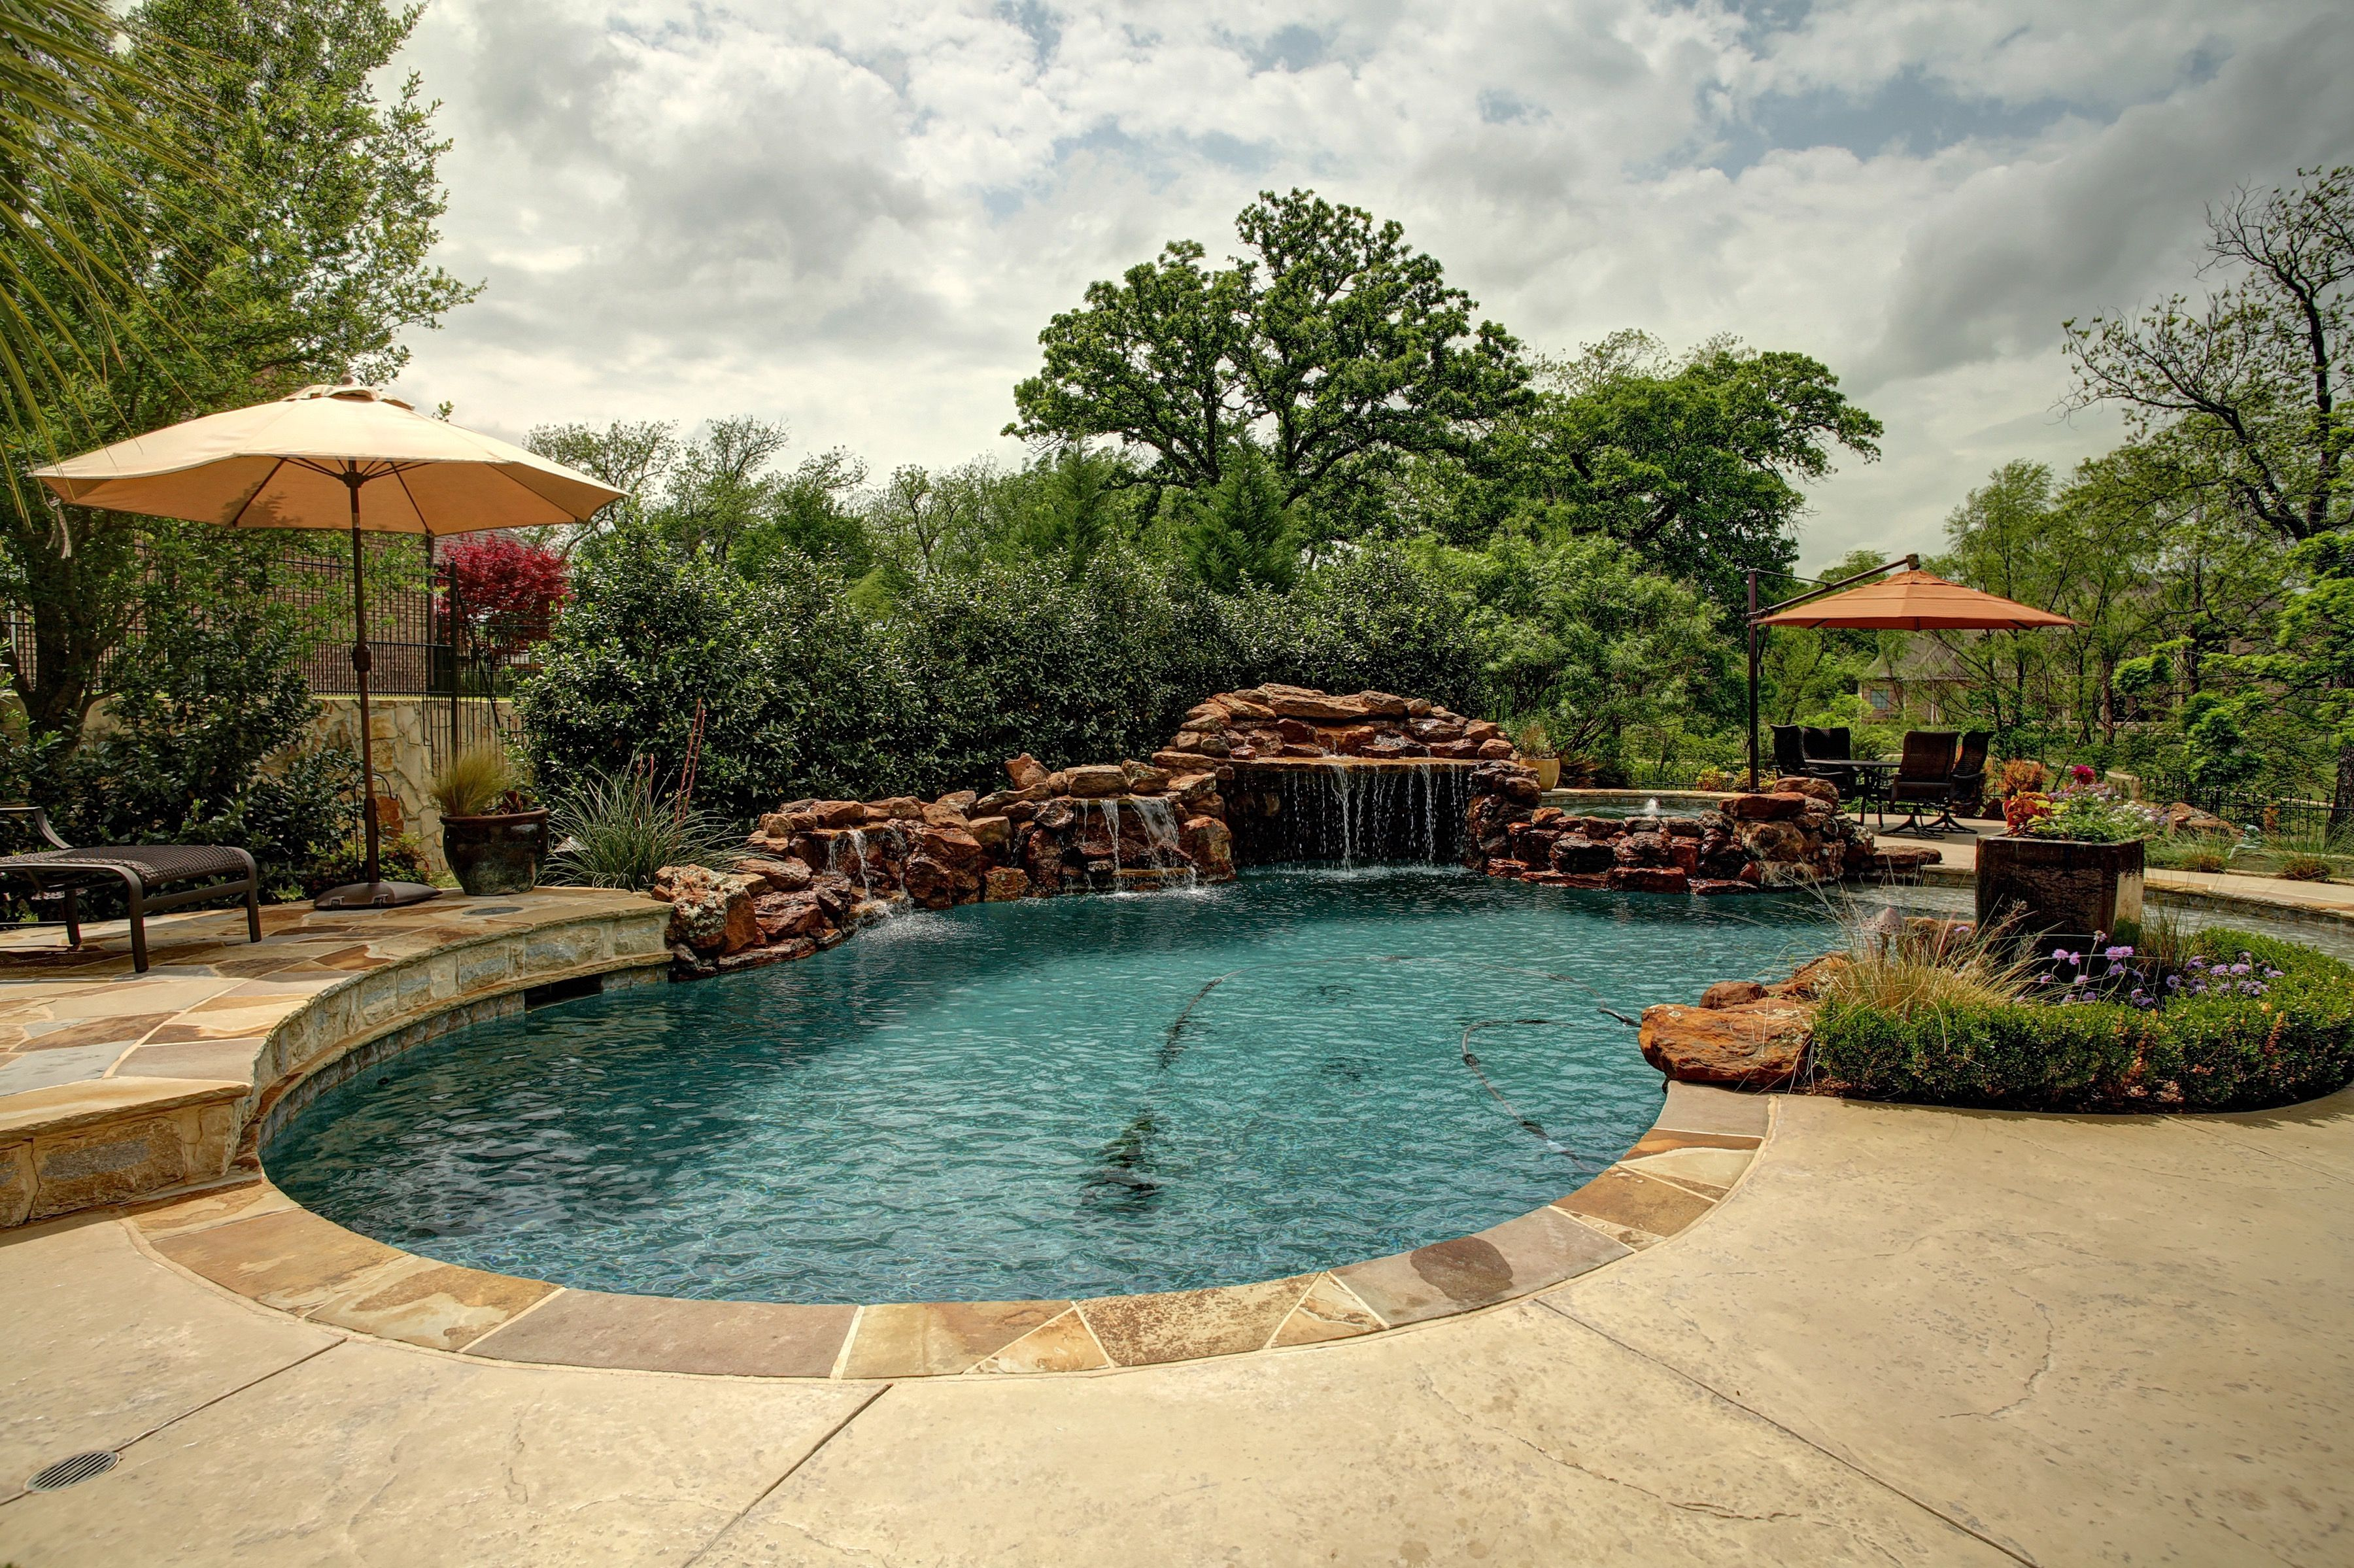 1608 buckingham drive keller texas 76262 beautiful home